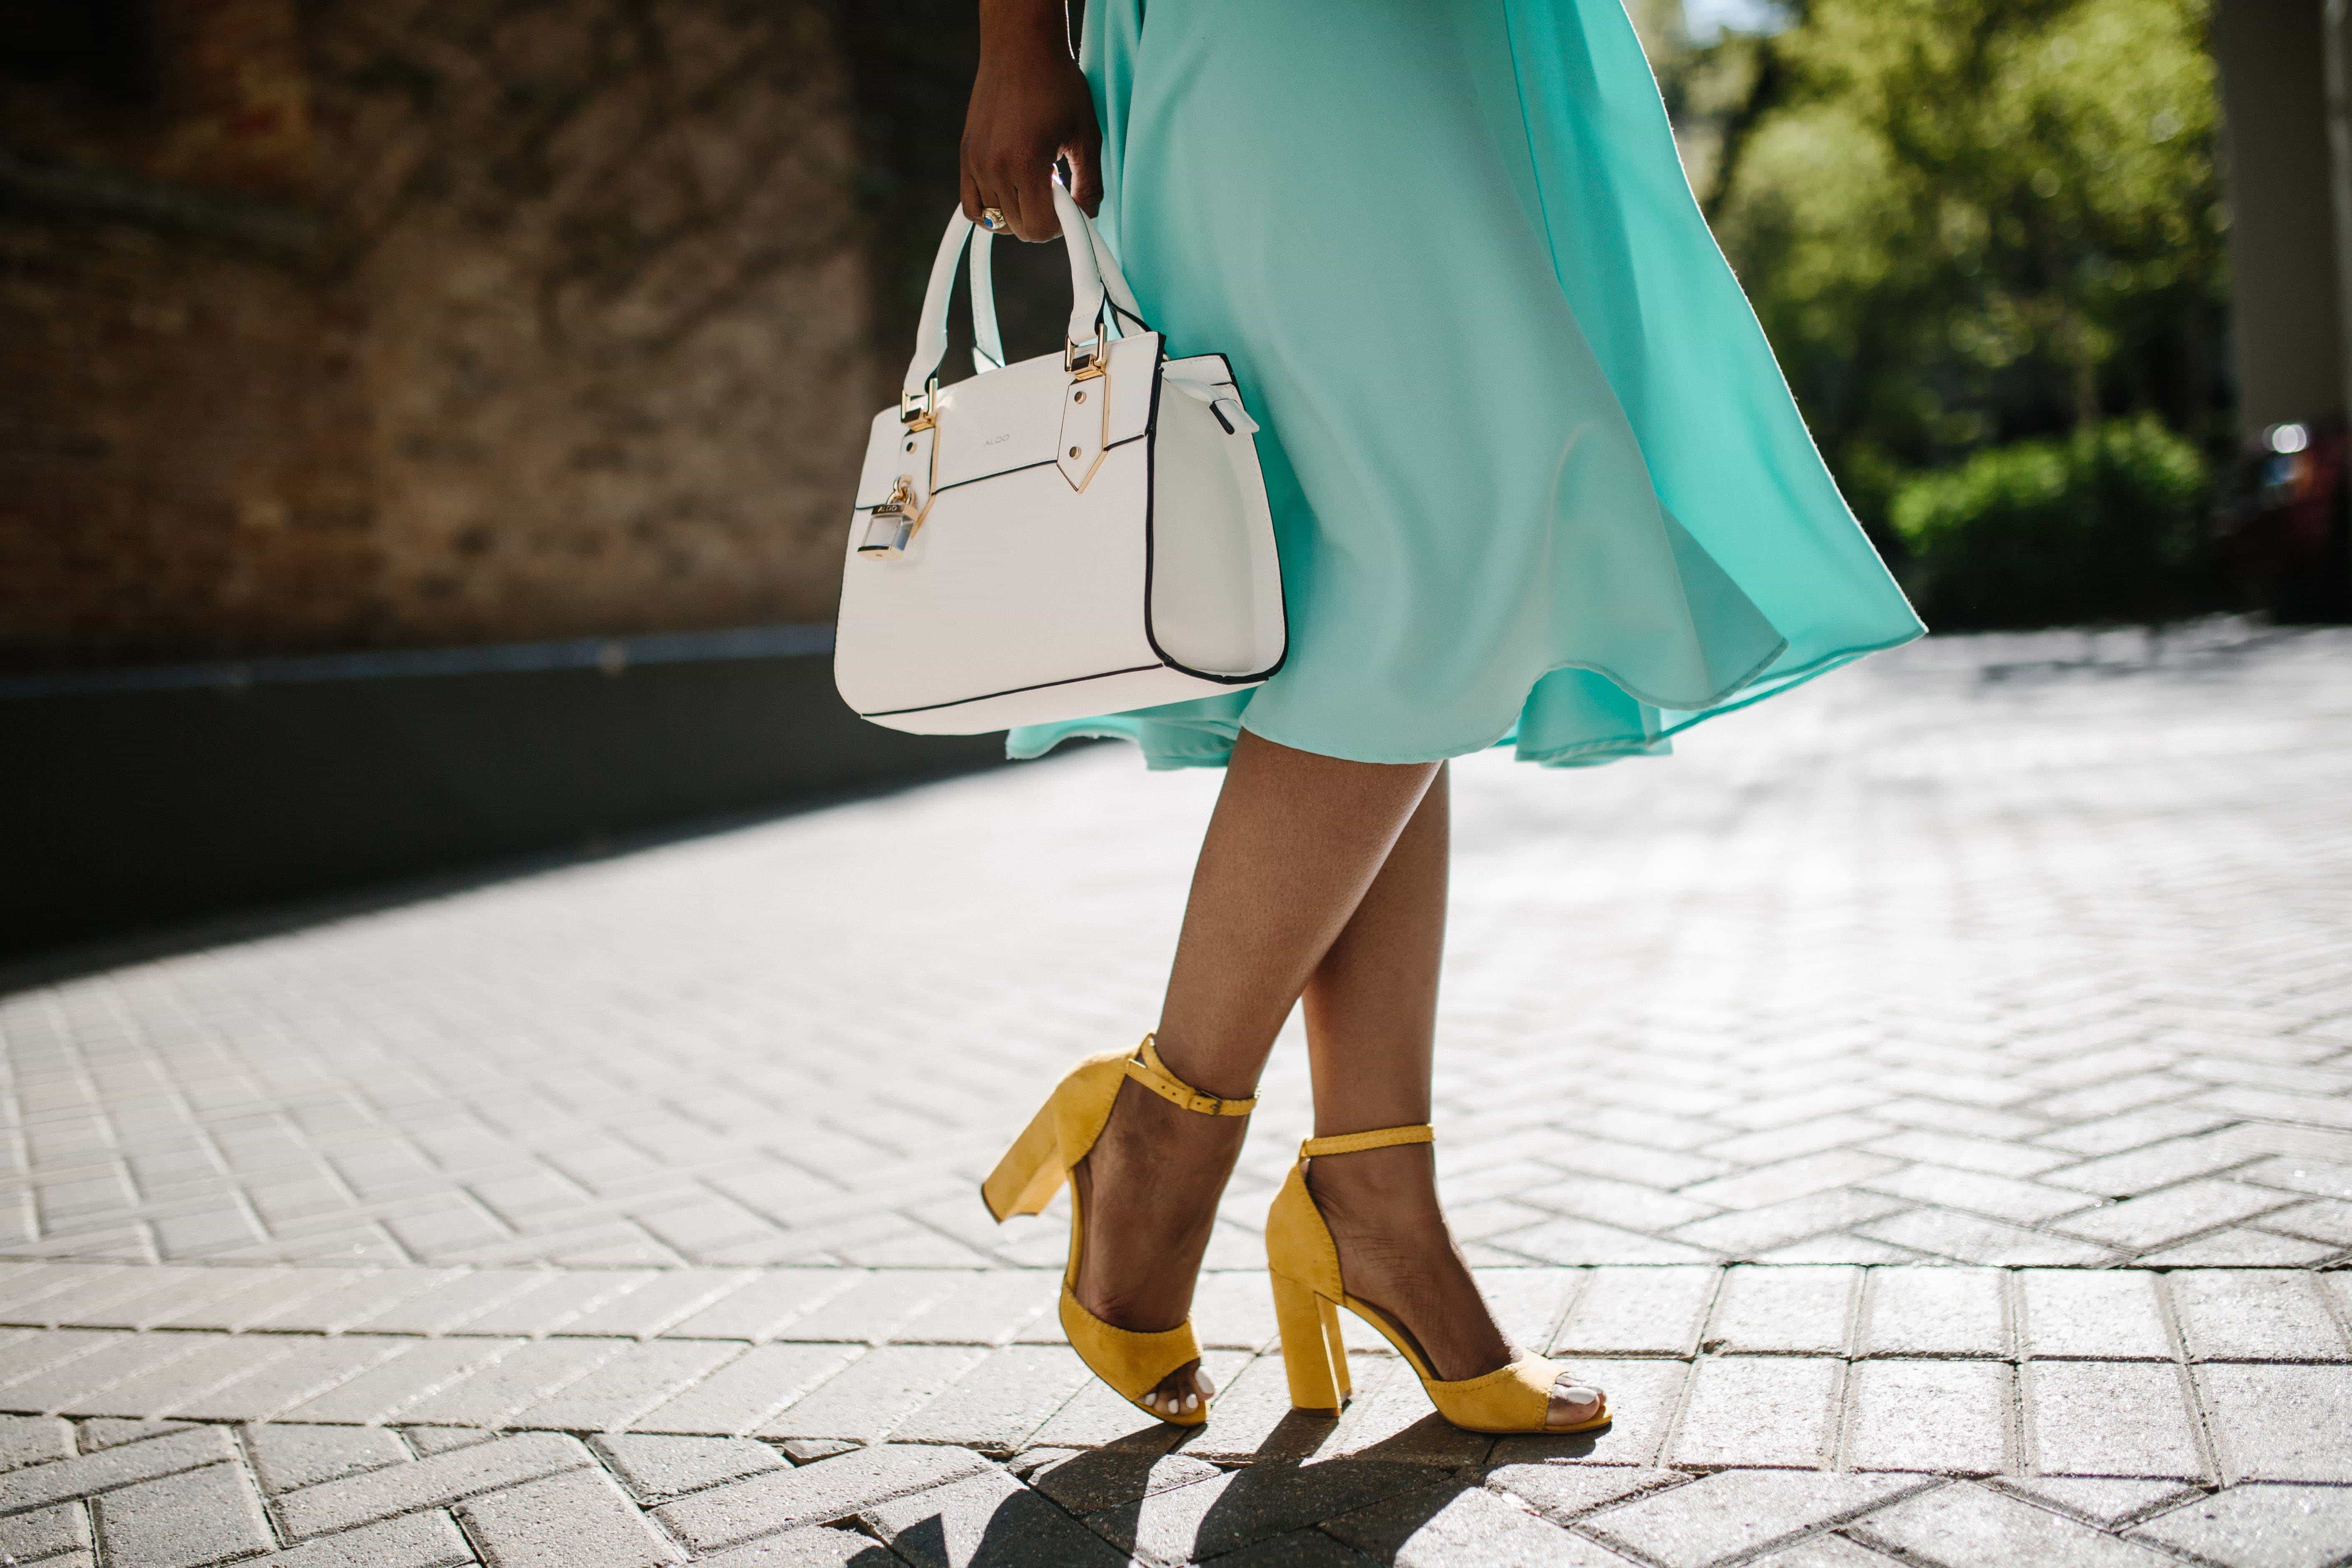 ALDO Mini Bag and Shoes